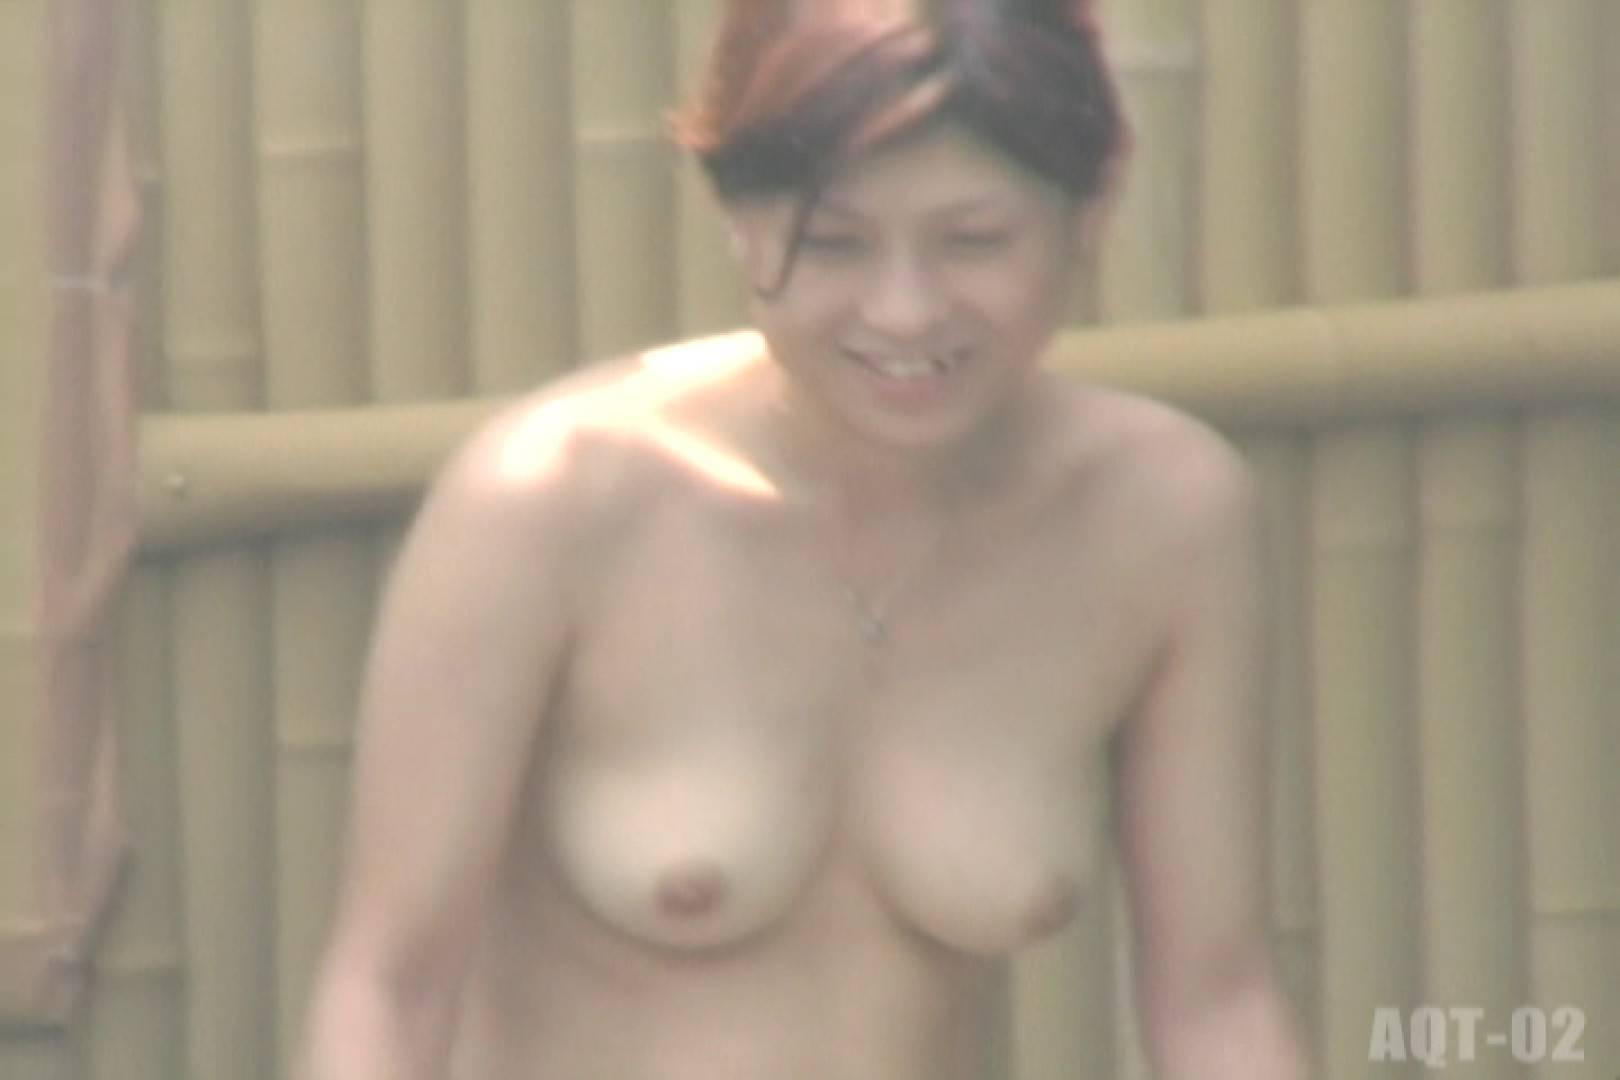 Aquaな露天風呂Vol.726 OLのエロ生活 おまんこ無修正動画無料 84連発 44